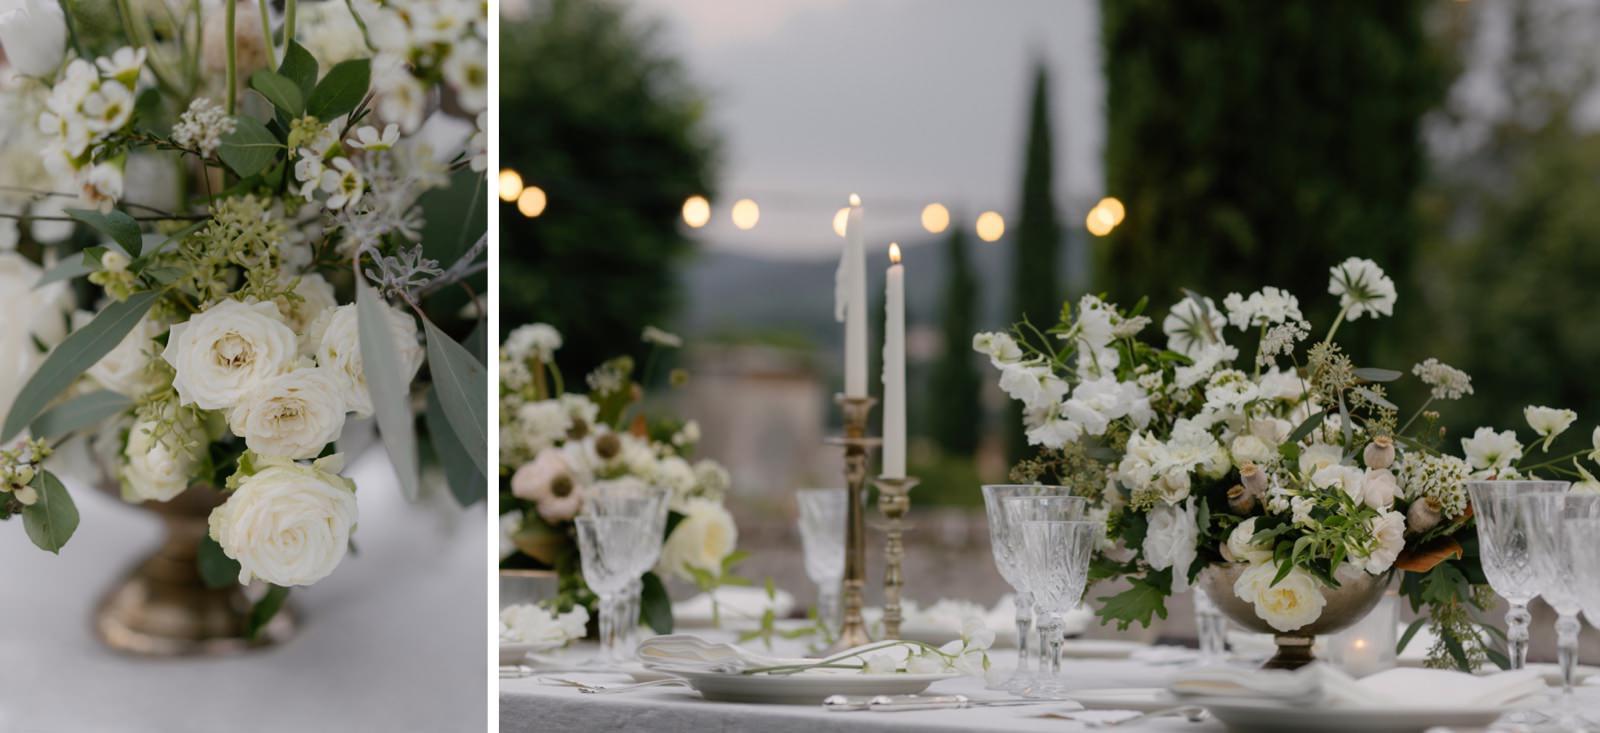 reception Tuscany wedding